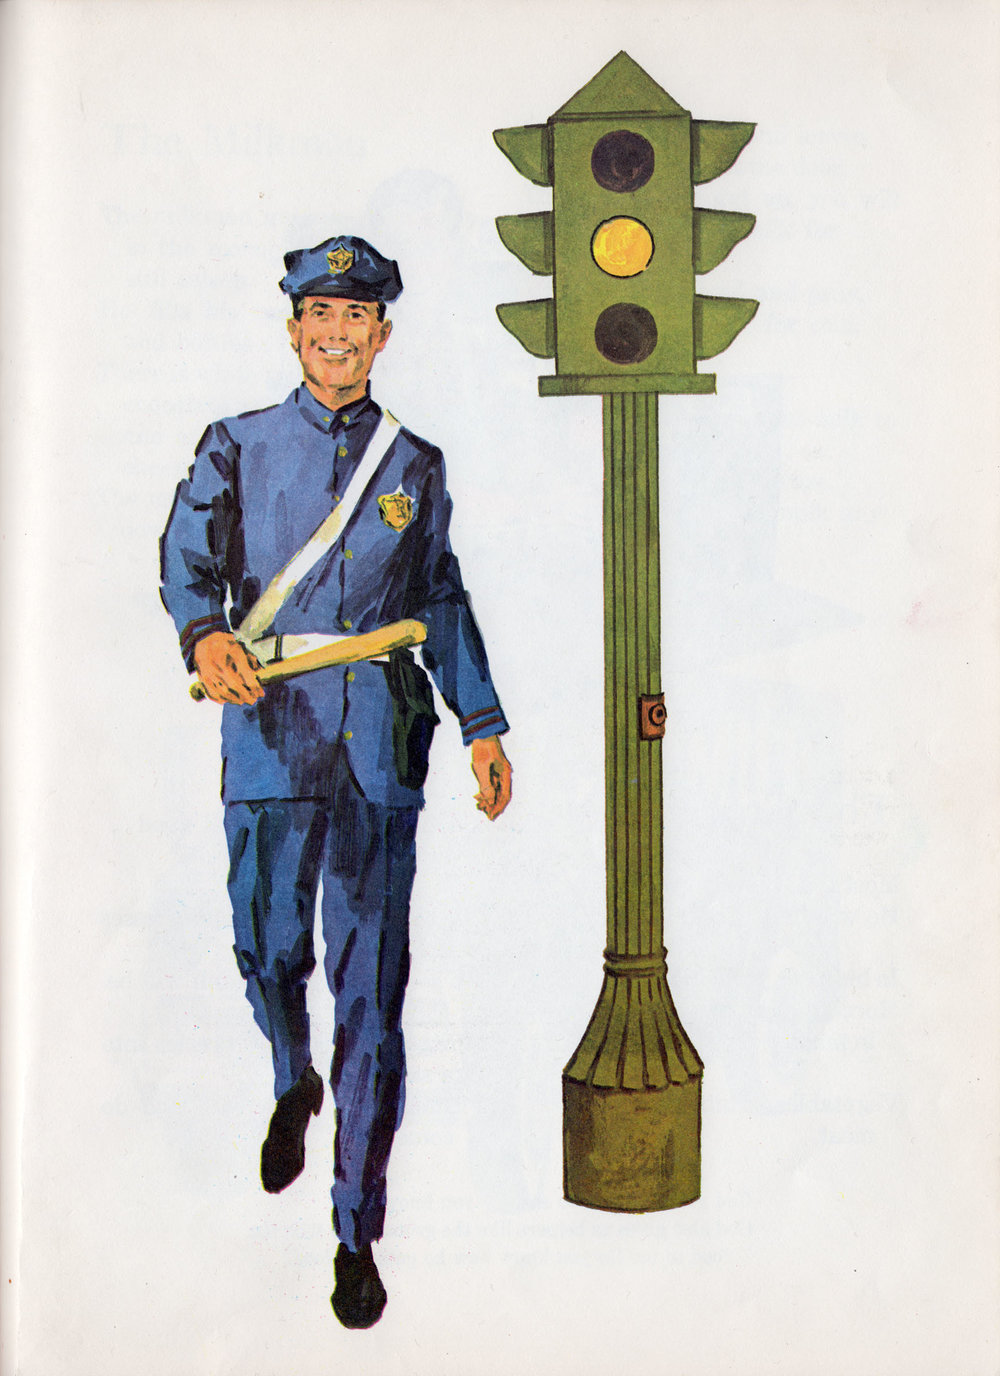 John Ham, Our Helpers, Ruth Shannon Odor, Standard Publishing Co., Cincinnati, 1968 illustration